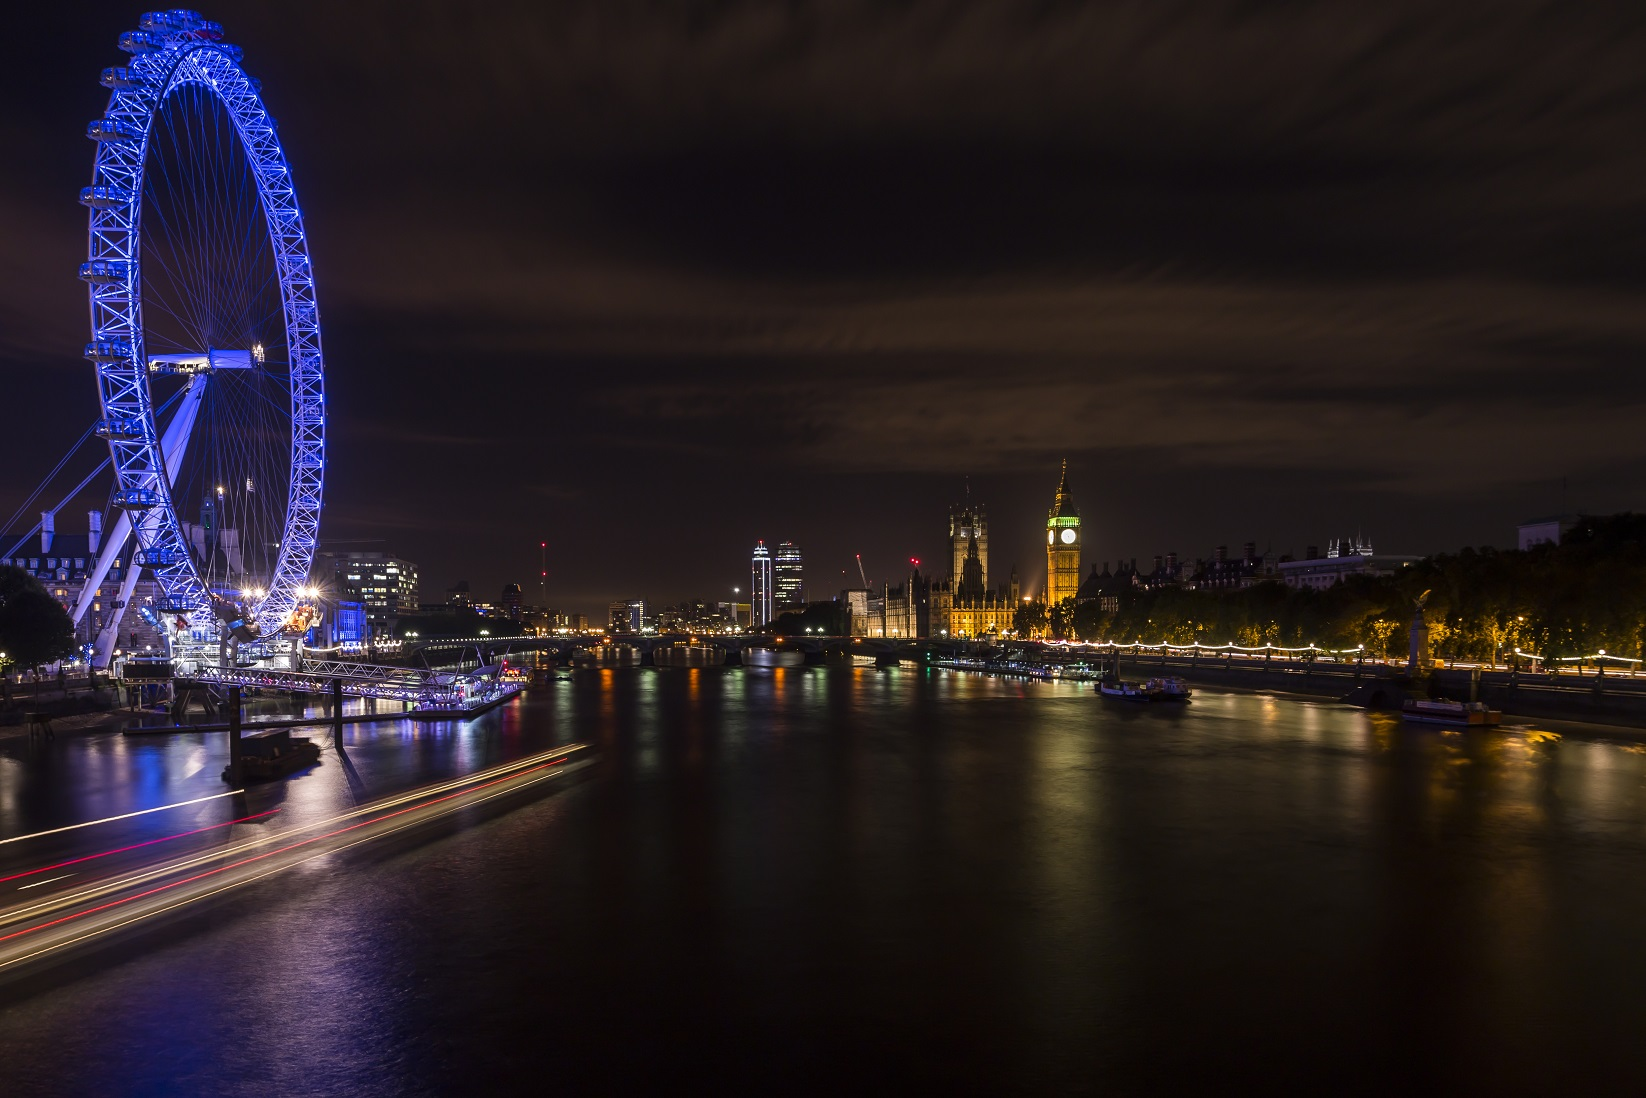 Londra: London Eye e Big Ben...